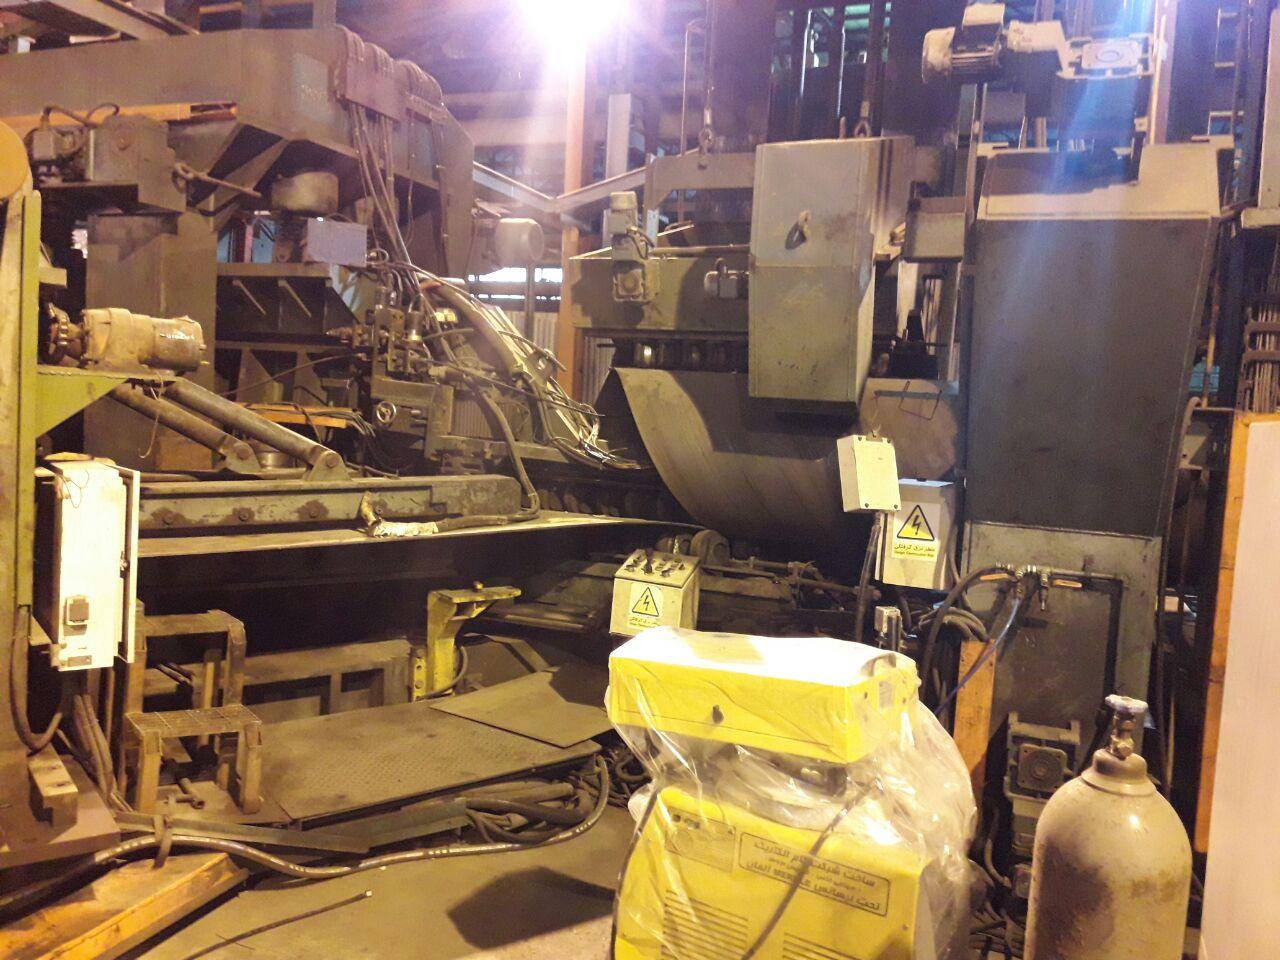 IMG 20200502 063813 324 شرکت لولهسازی اهواز در سال جهش تولید ظرفیت همکاری با صنایع را افزایش داد